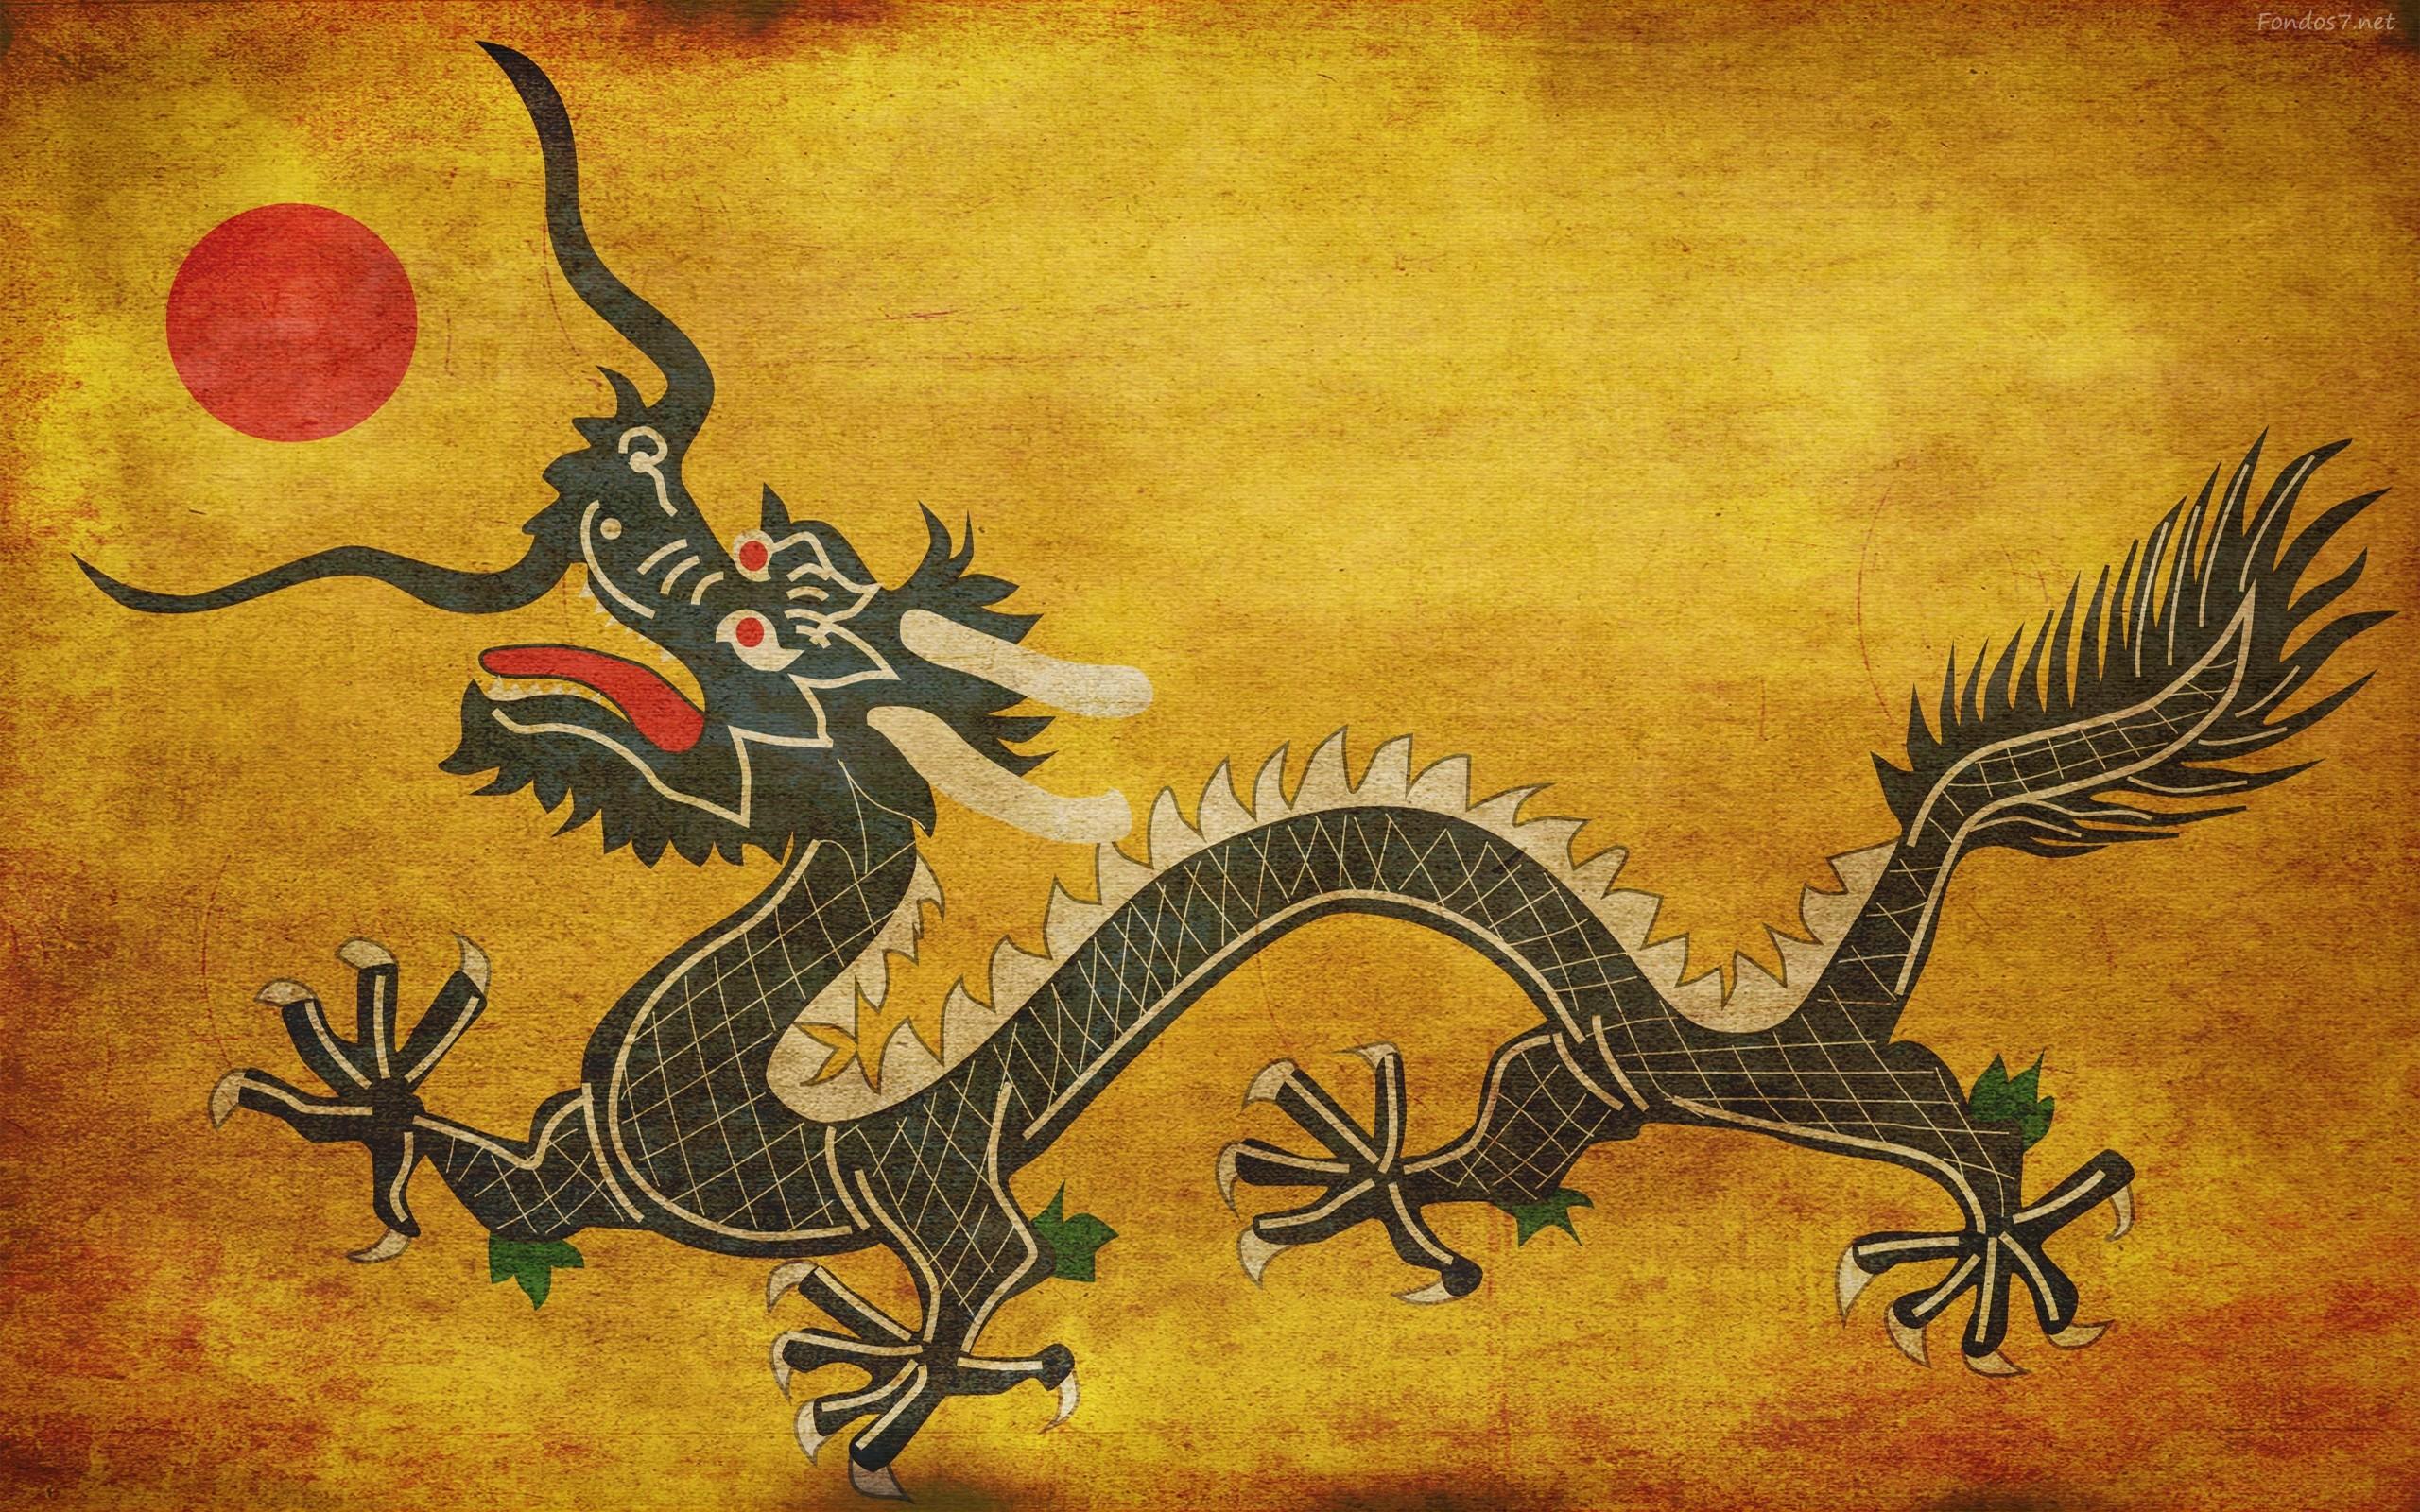 https://fondos7.net/wallpaper-original/wallpapers/Viejo-Dragon-Chino-Grunge-426.jpeg    Dragons   Pinterest   Dragon fight, Dragons and Wallpaper